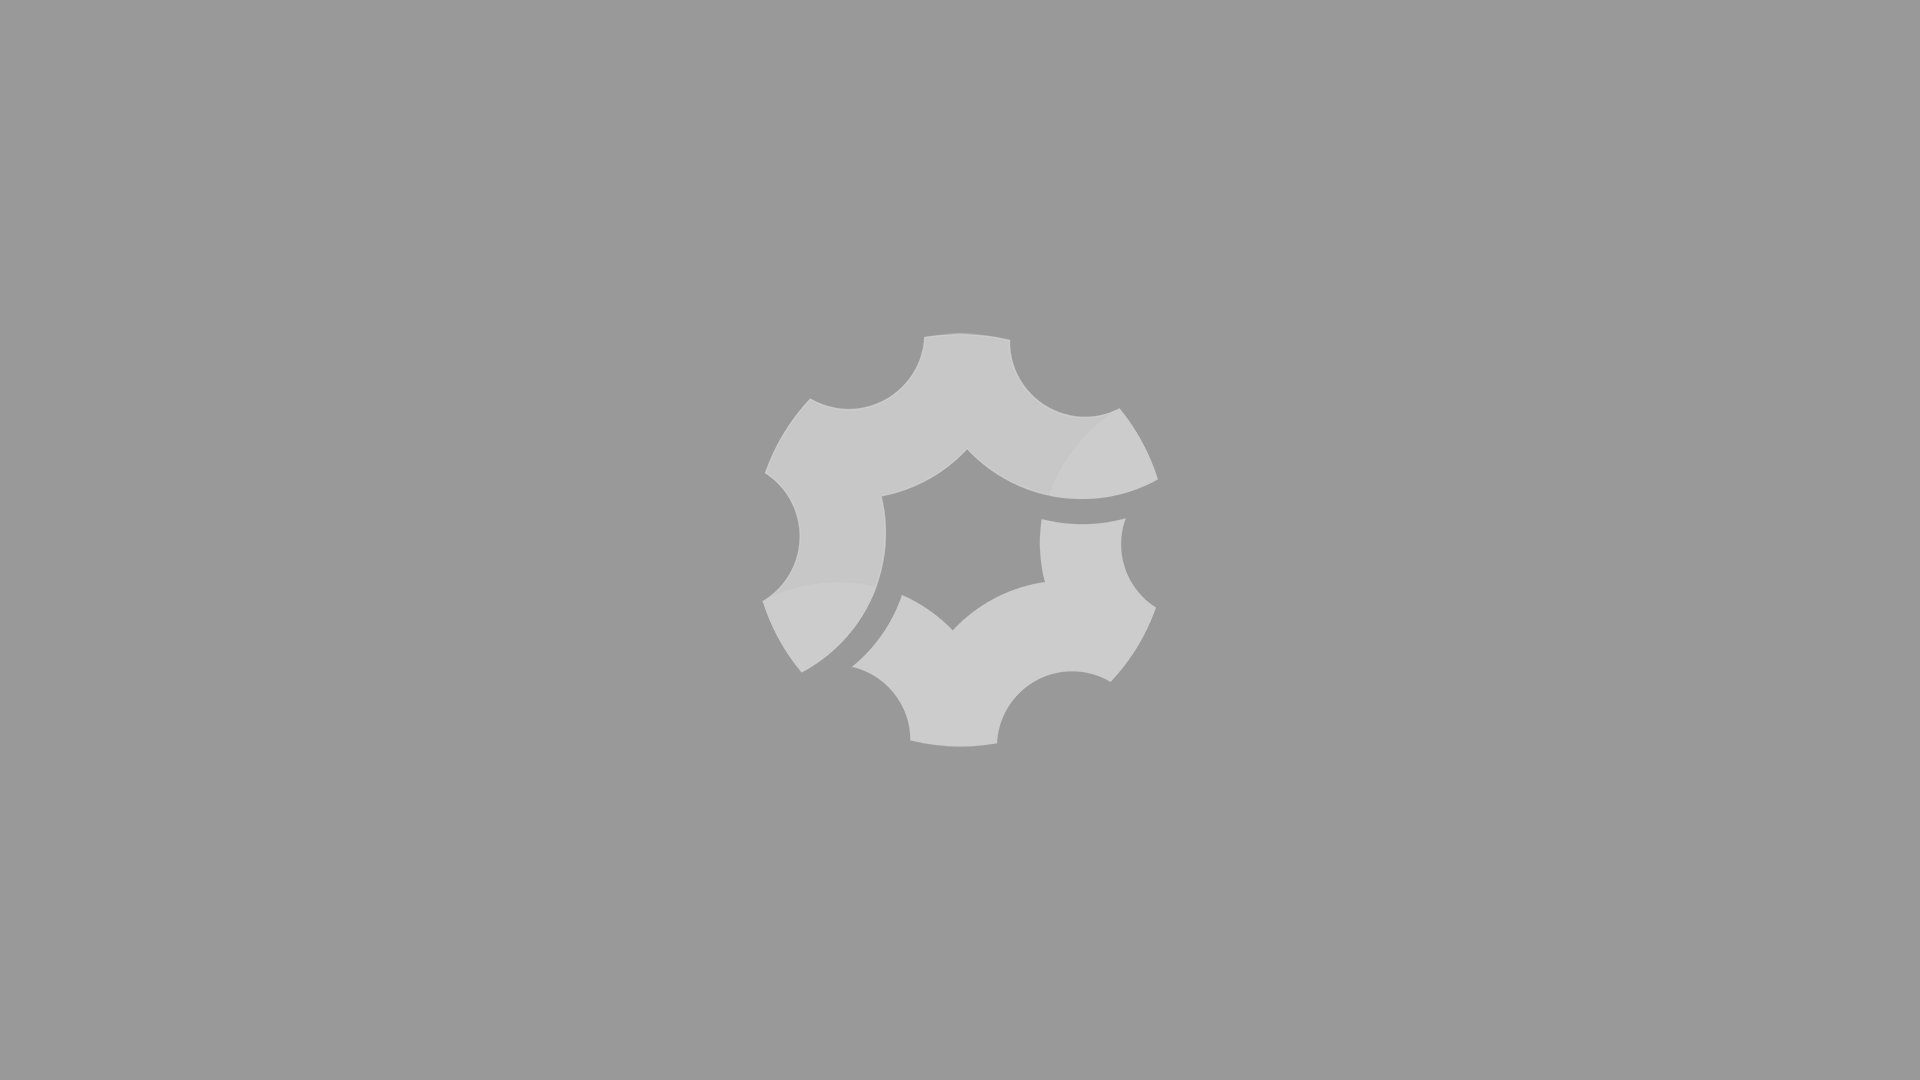 Full UFO & TFTD HYBRID mod ver 2.1 Patch